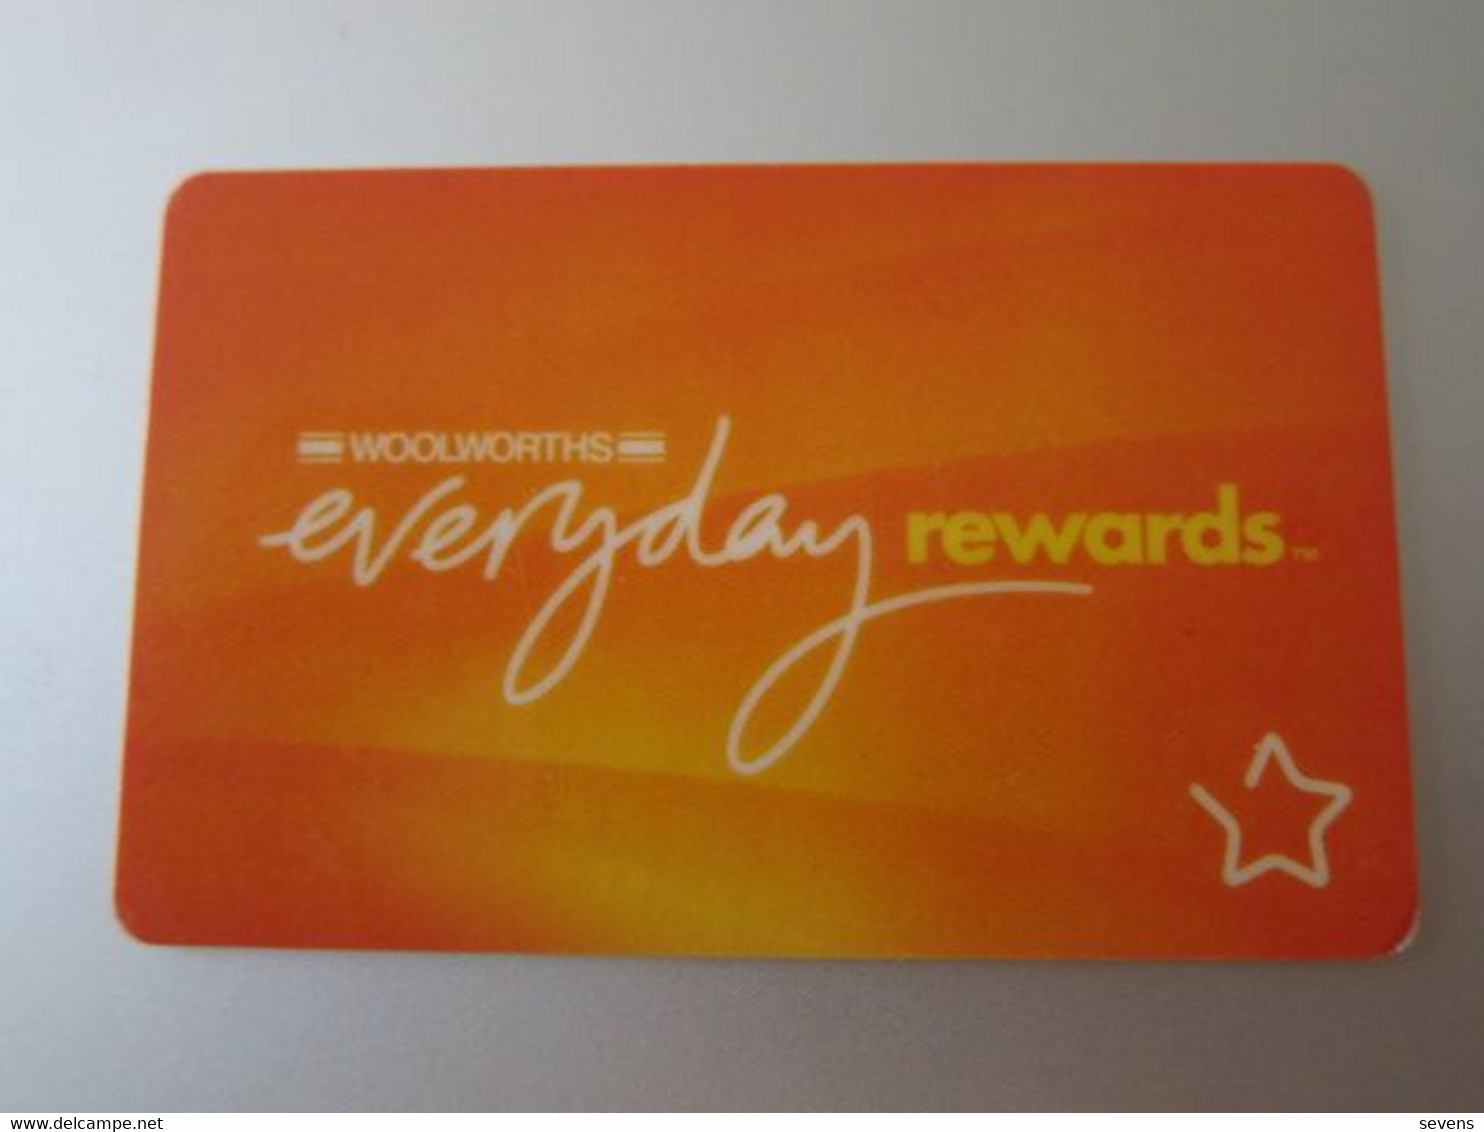 Australia Caltex/Woolworths Rewards Card - Unclassified